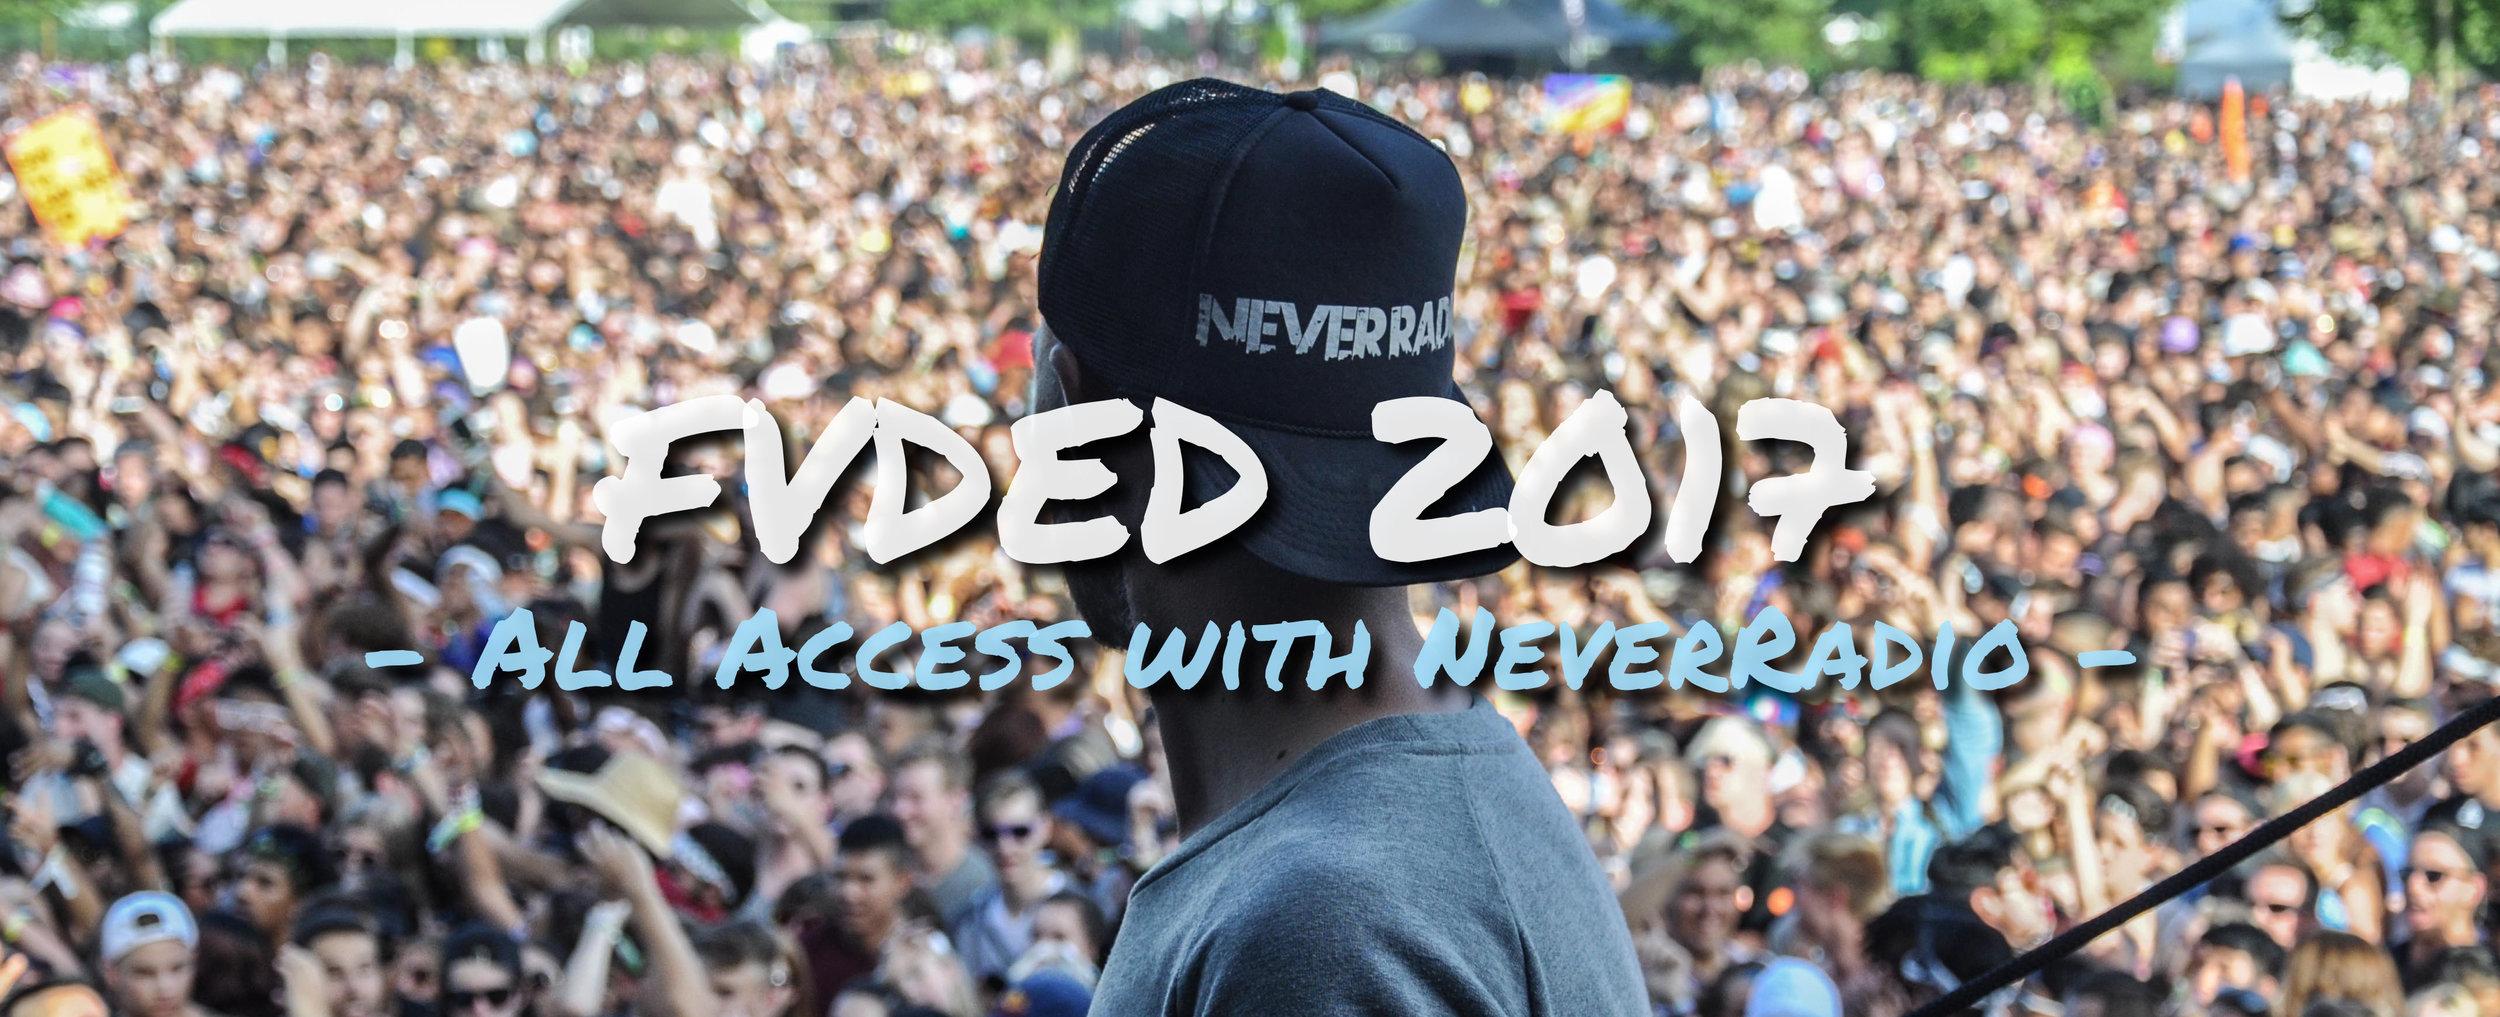 NeverRadio Fvded 2017 All Access